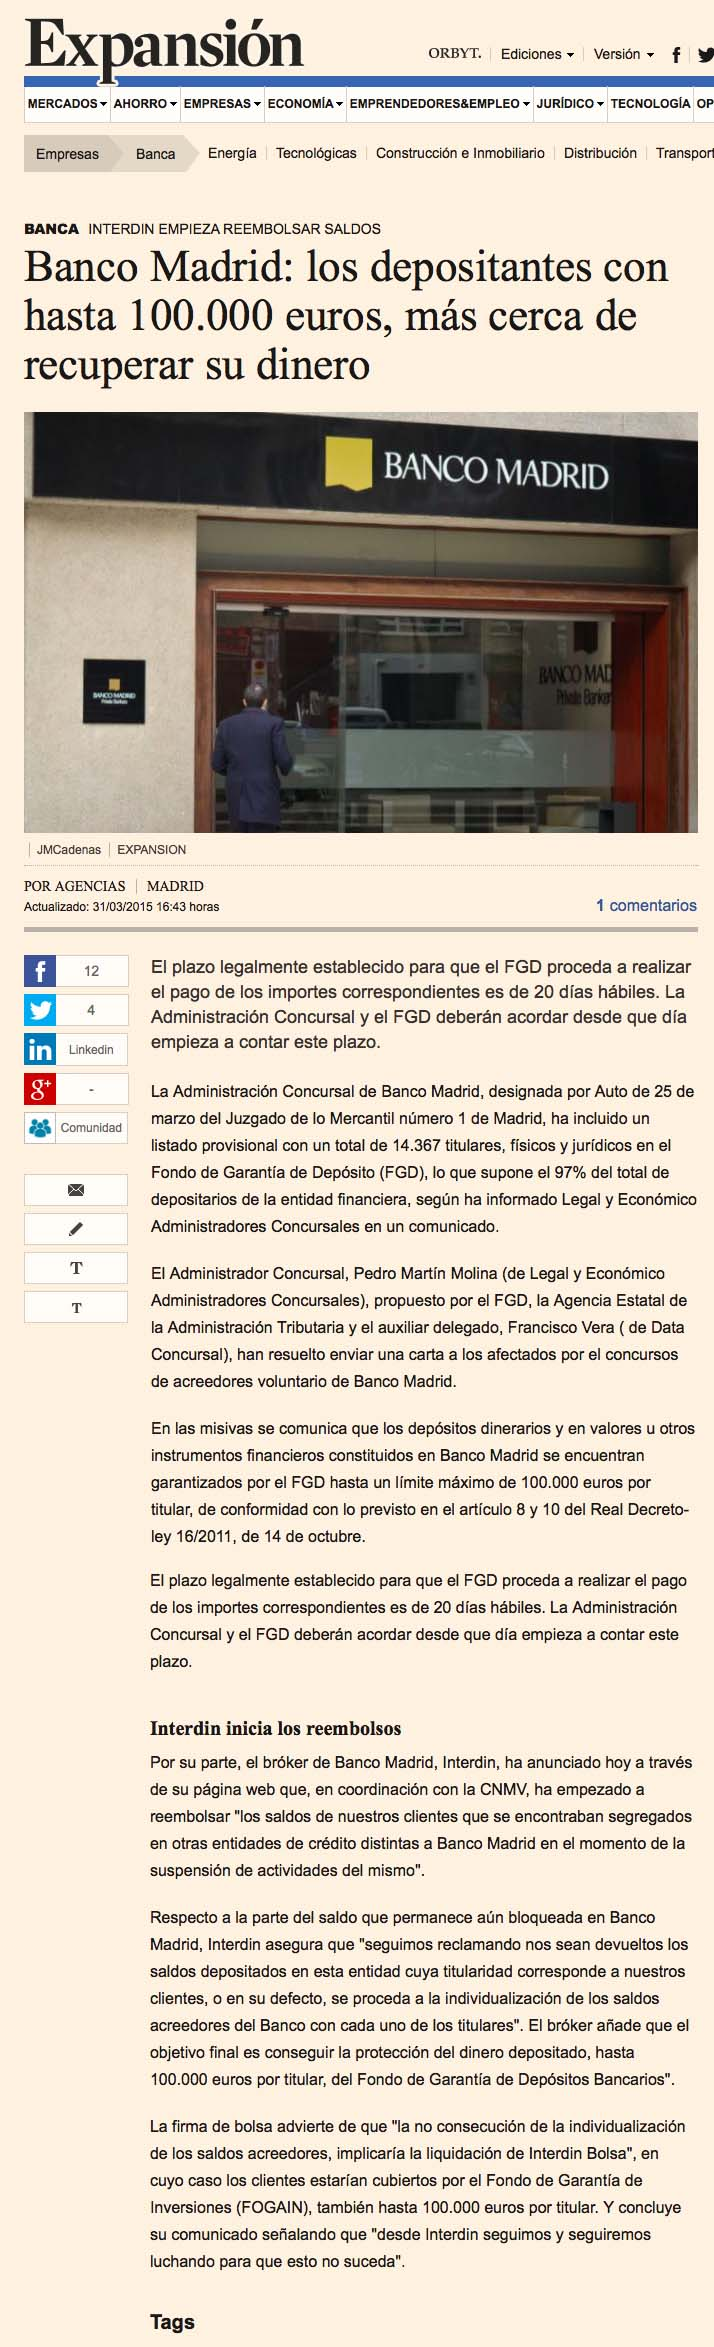 banco madrid expansion